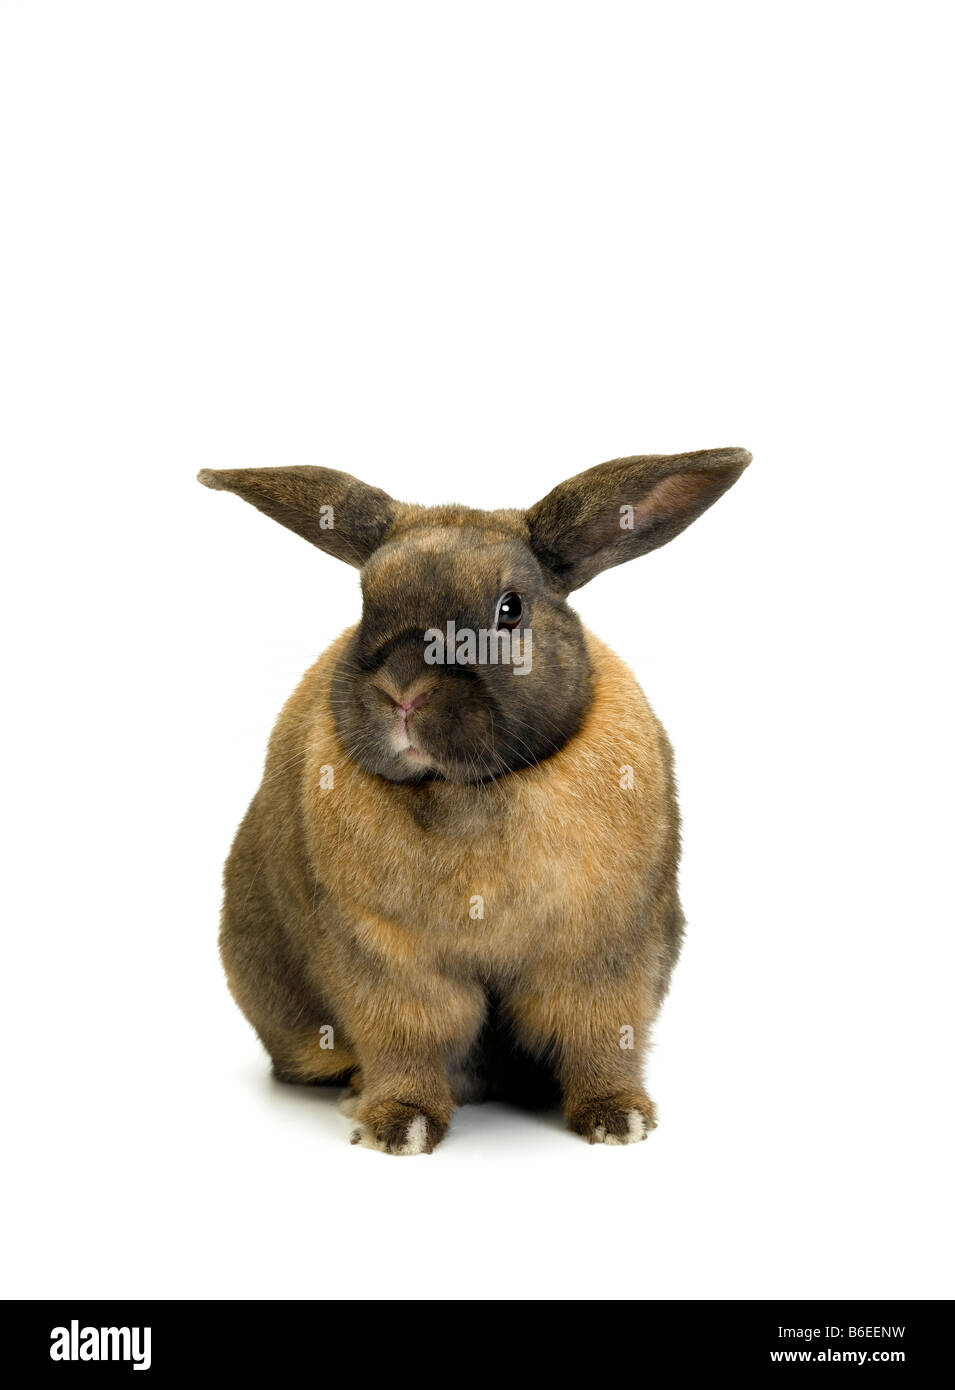 Domestic Rabbit - Stock Image